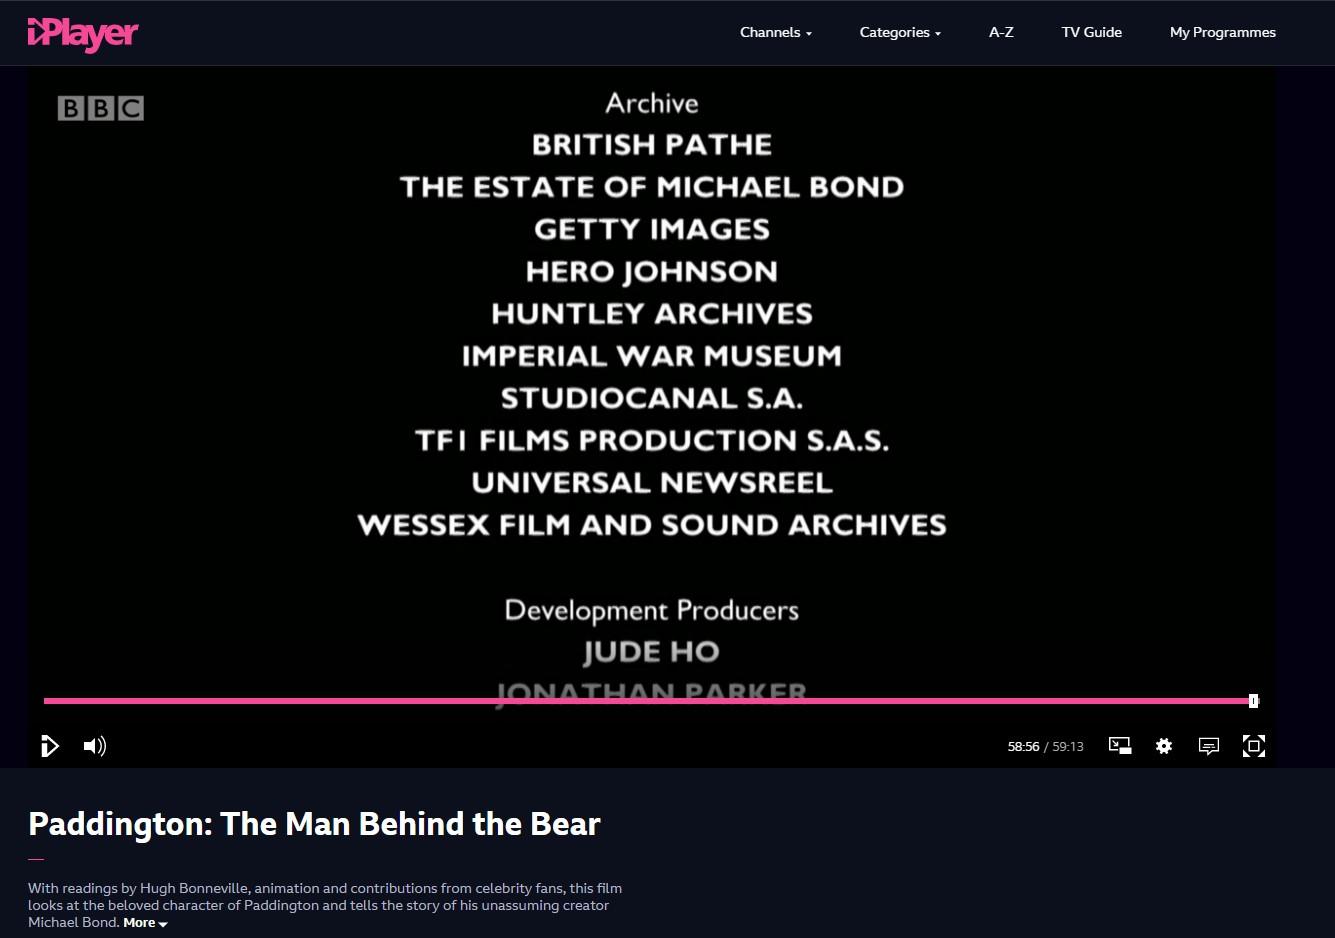 Hero Johnson credit, 'Paddington: The Man Behind the Bear'